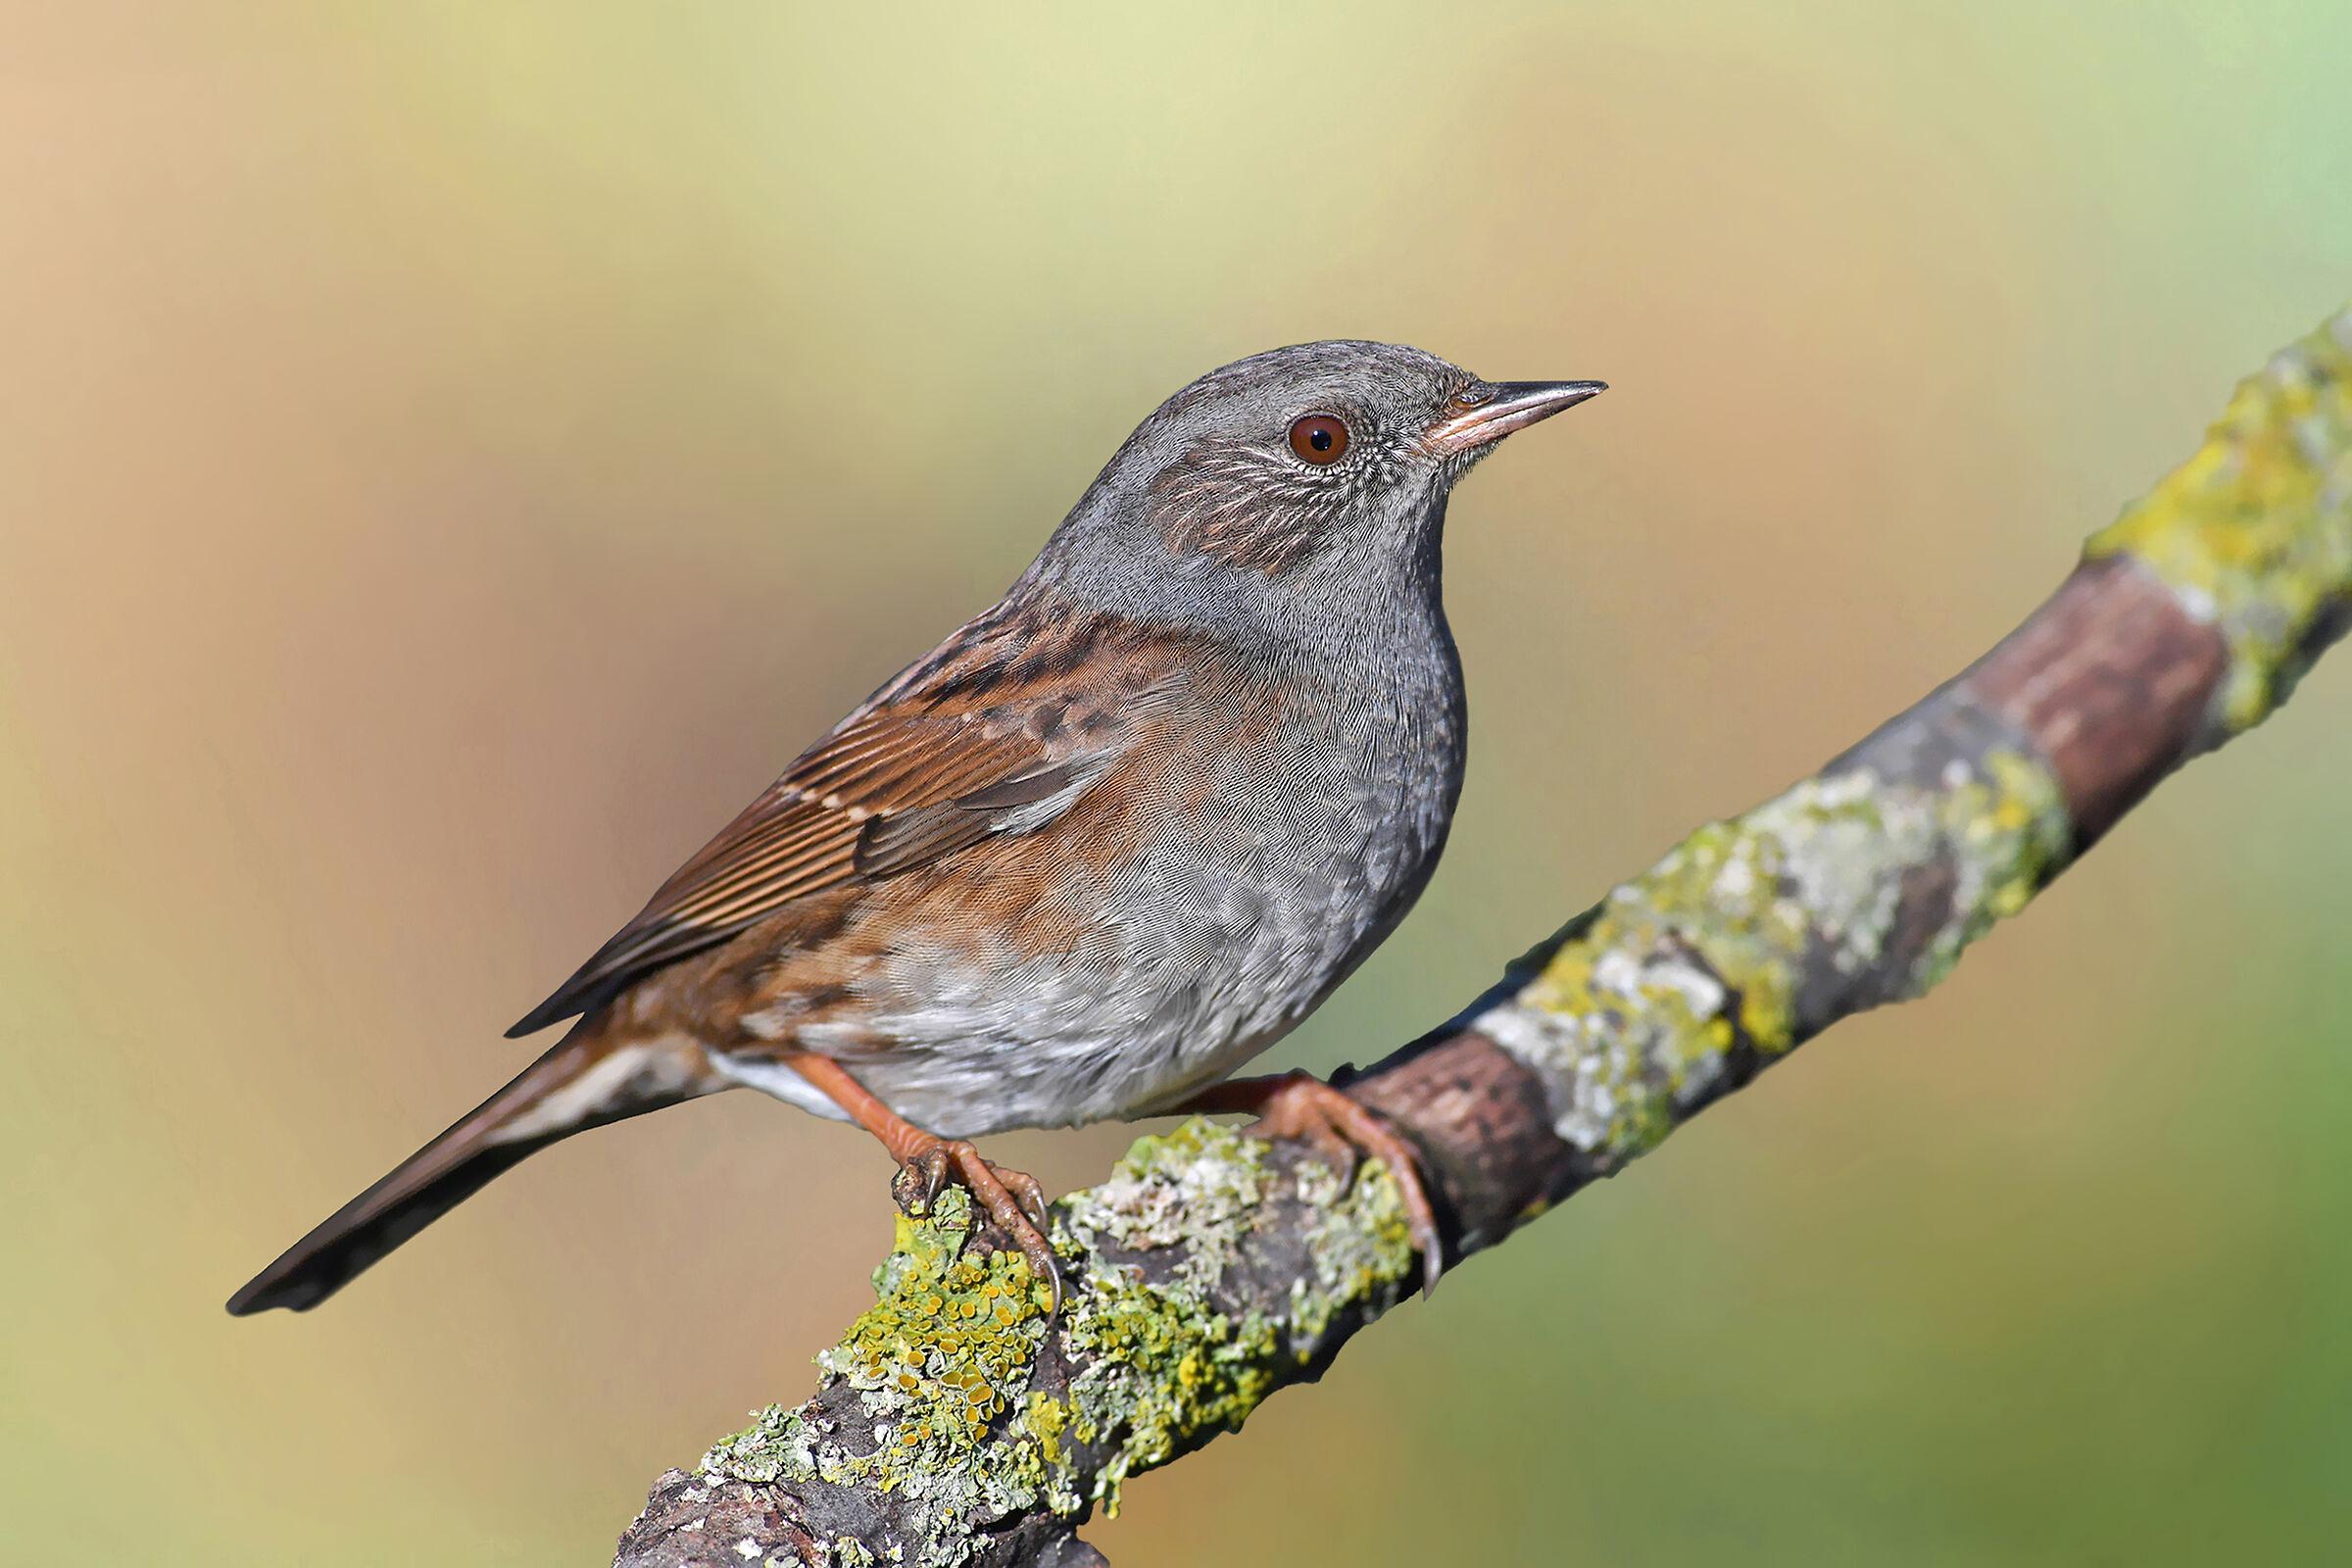 Feather Stories 8 (Sparrow slap)...